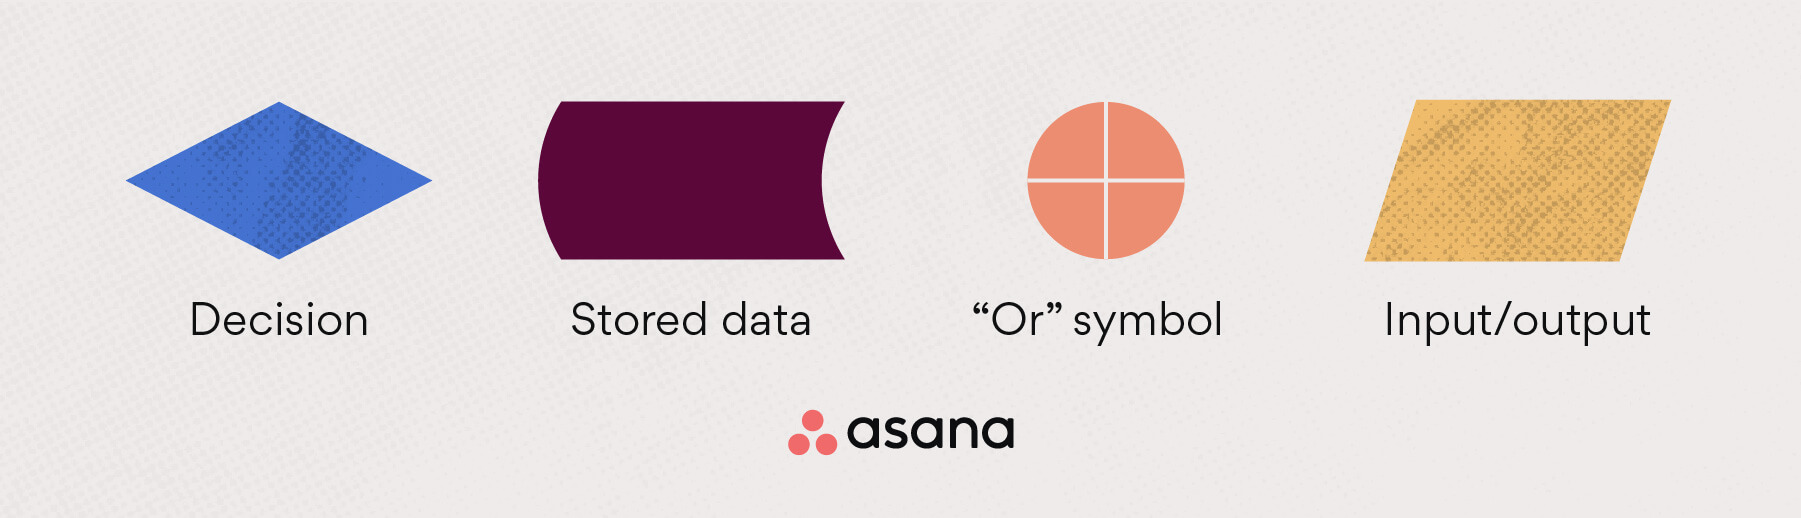 Flowchart symbols: decision, stored data, or symbol + input/output